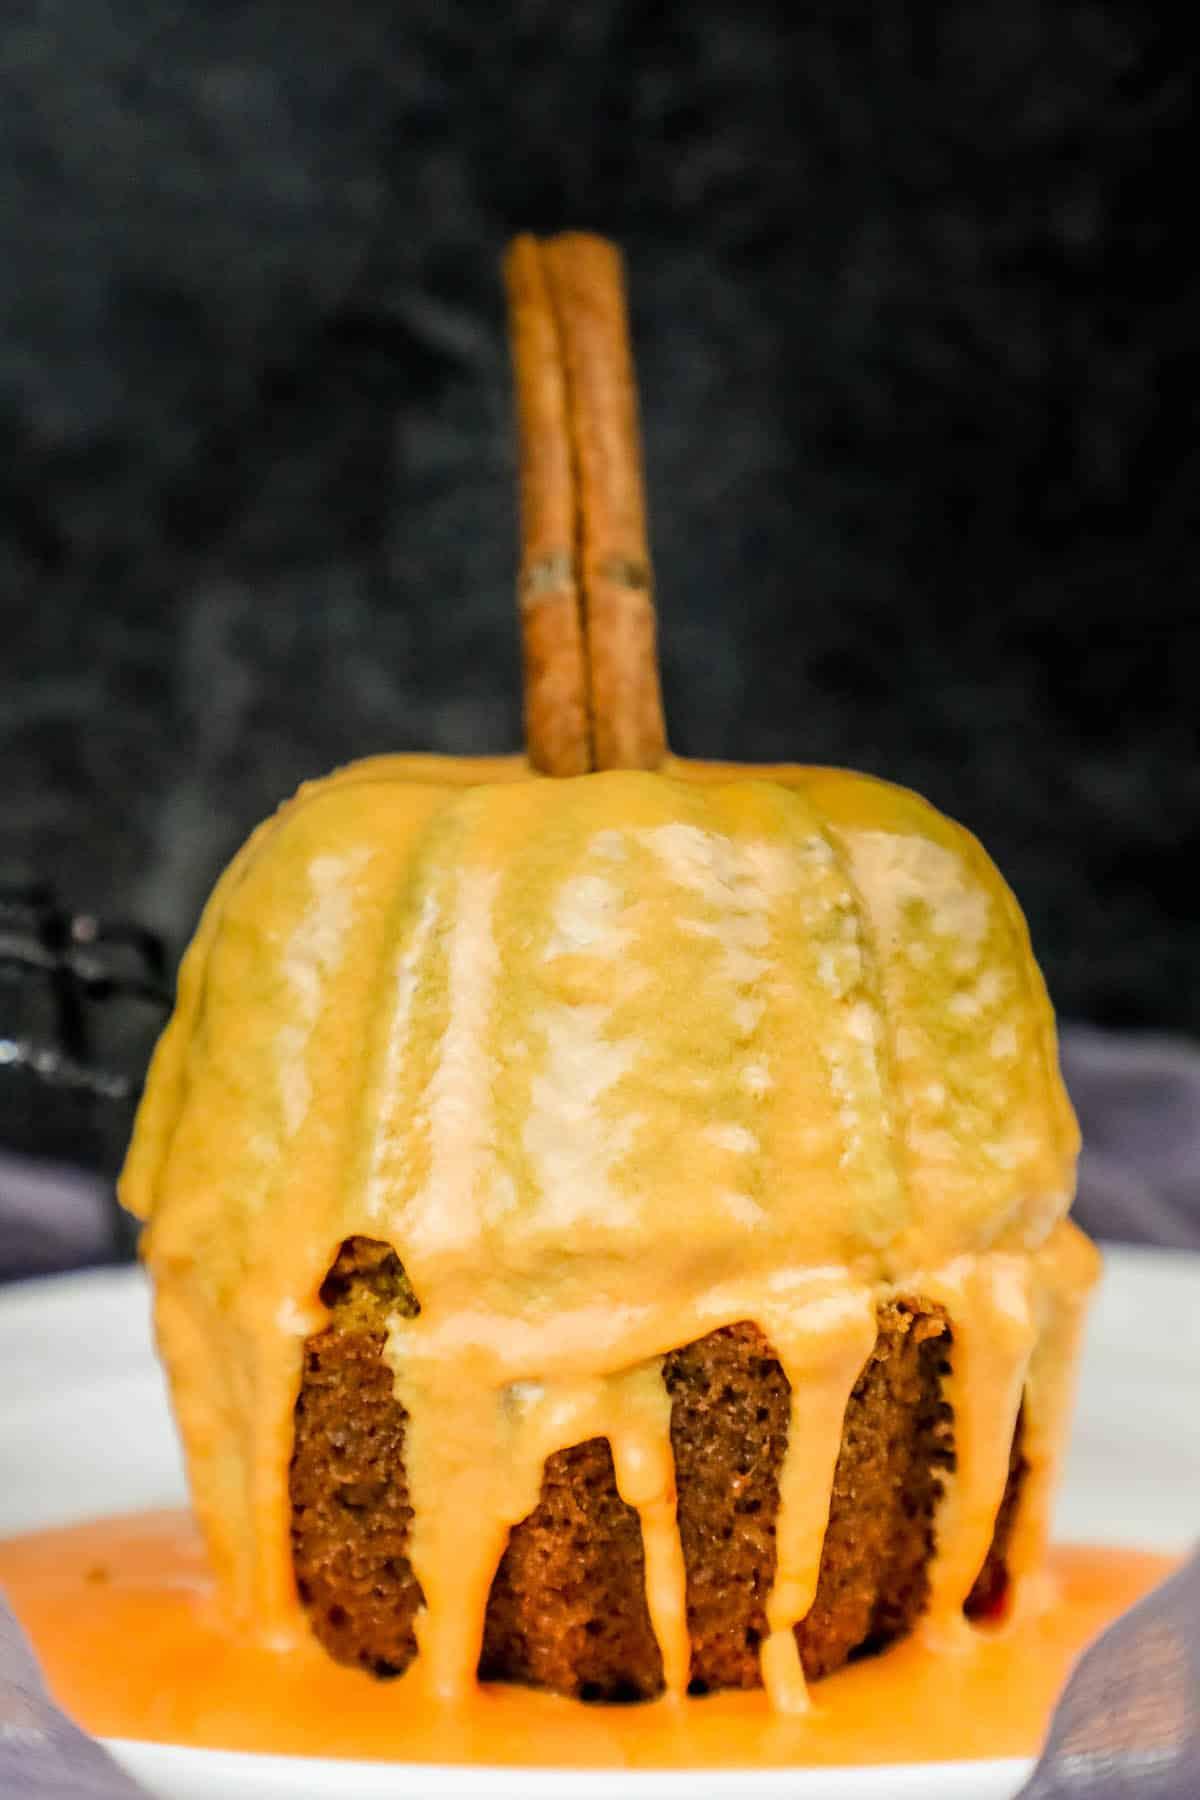 pumpkin bread mini pumpkins bunt cake halloween party decor recipe